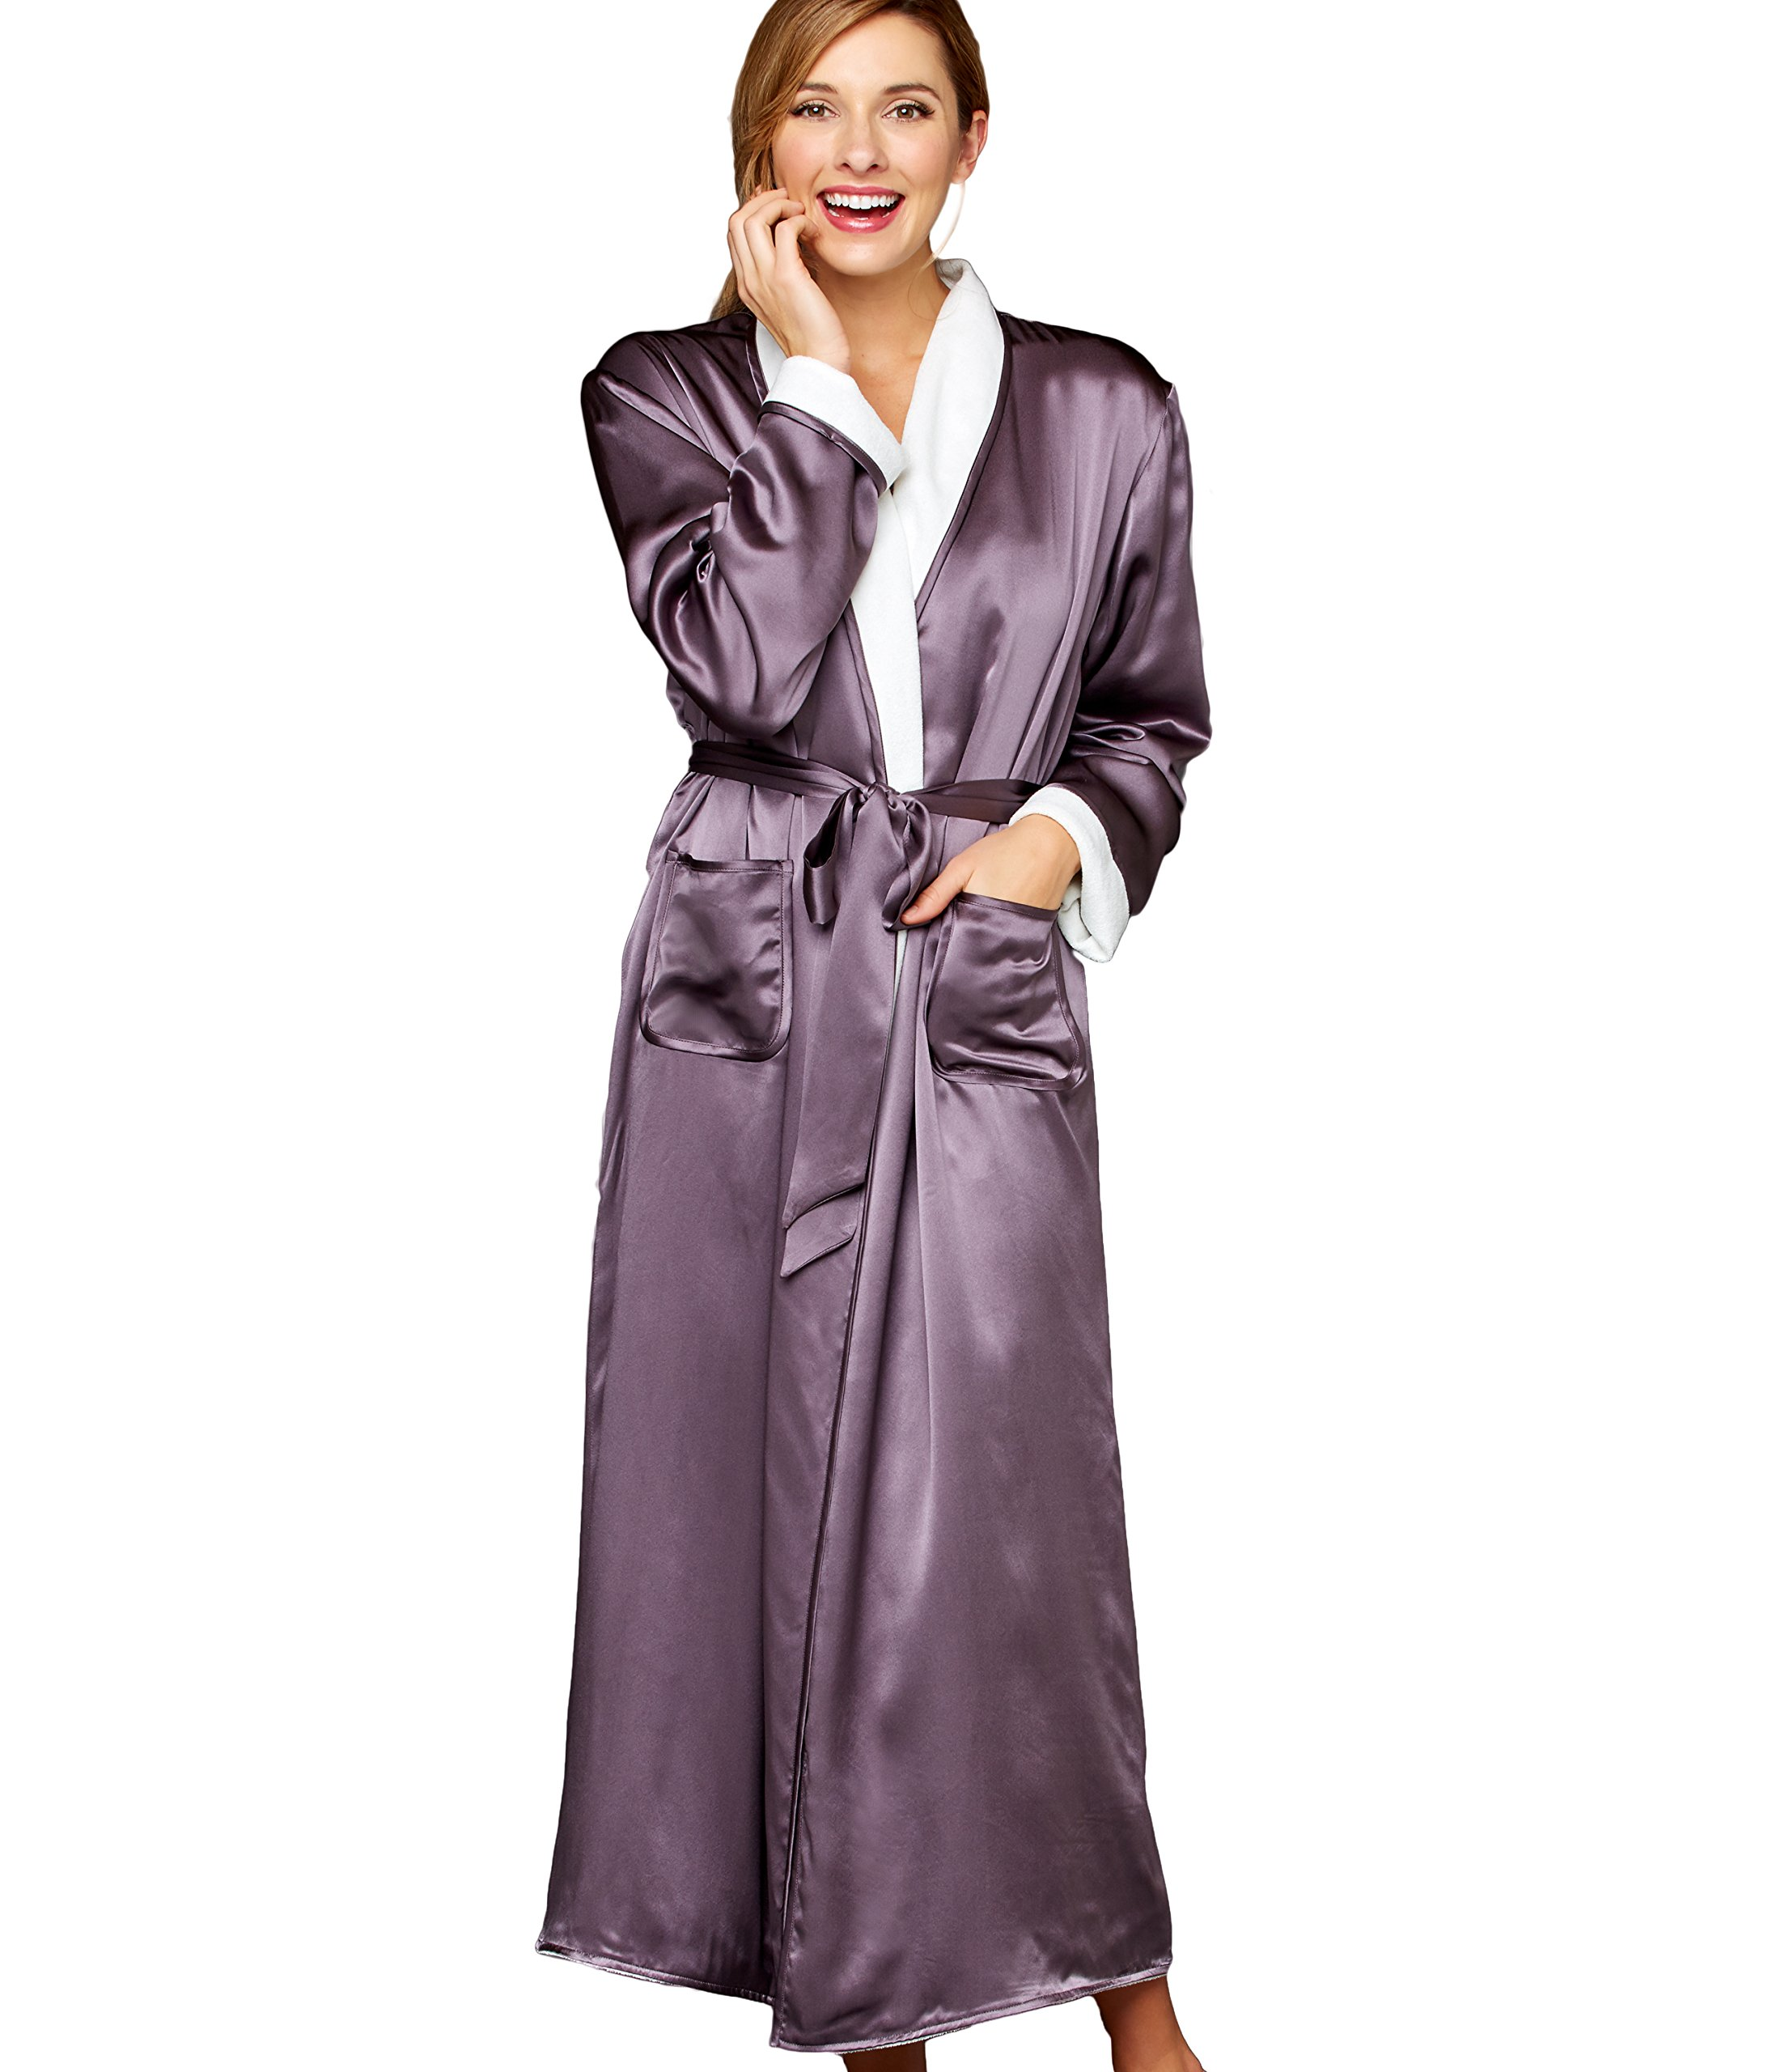 Julianna Rae Women's 100% Silk, Il Cieli Spa Robe, Tanzanite, L/XL by Julianna Rae